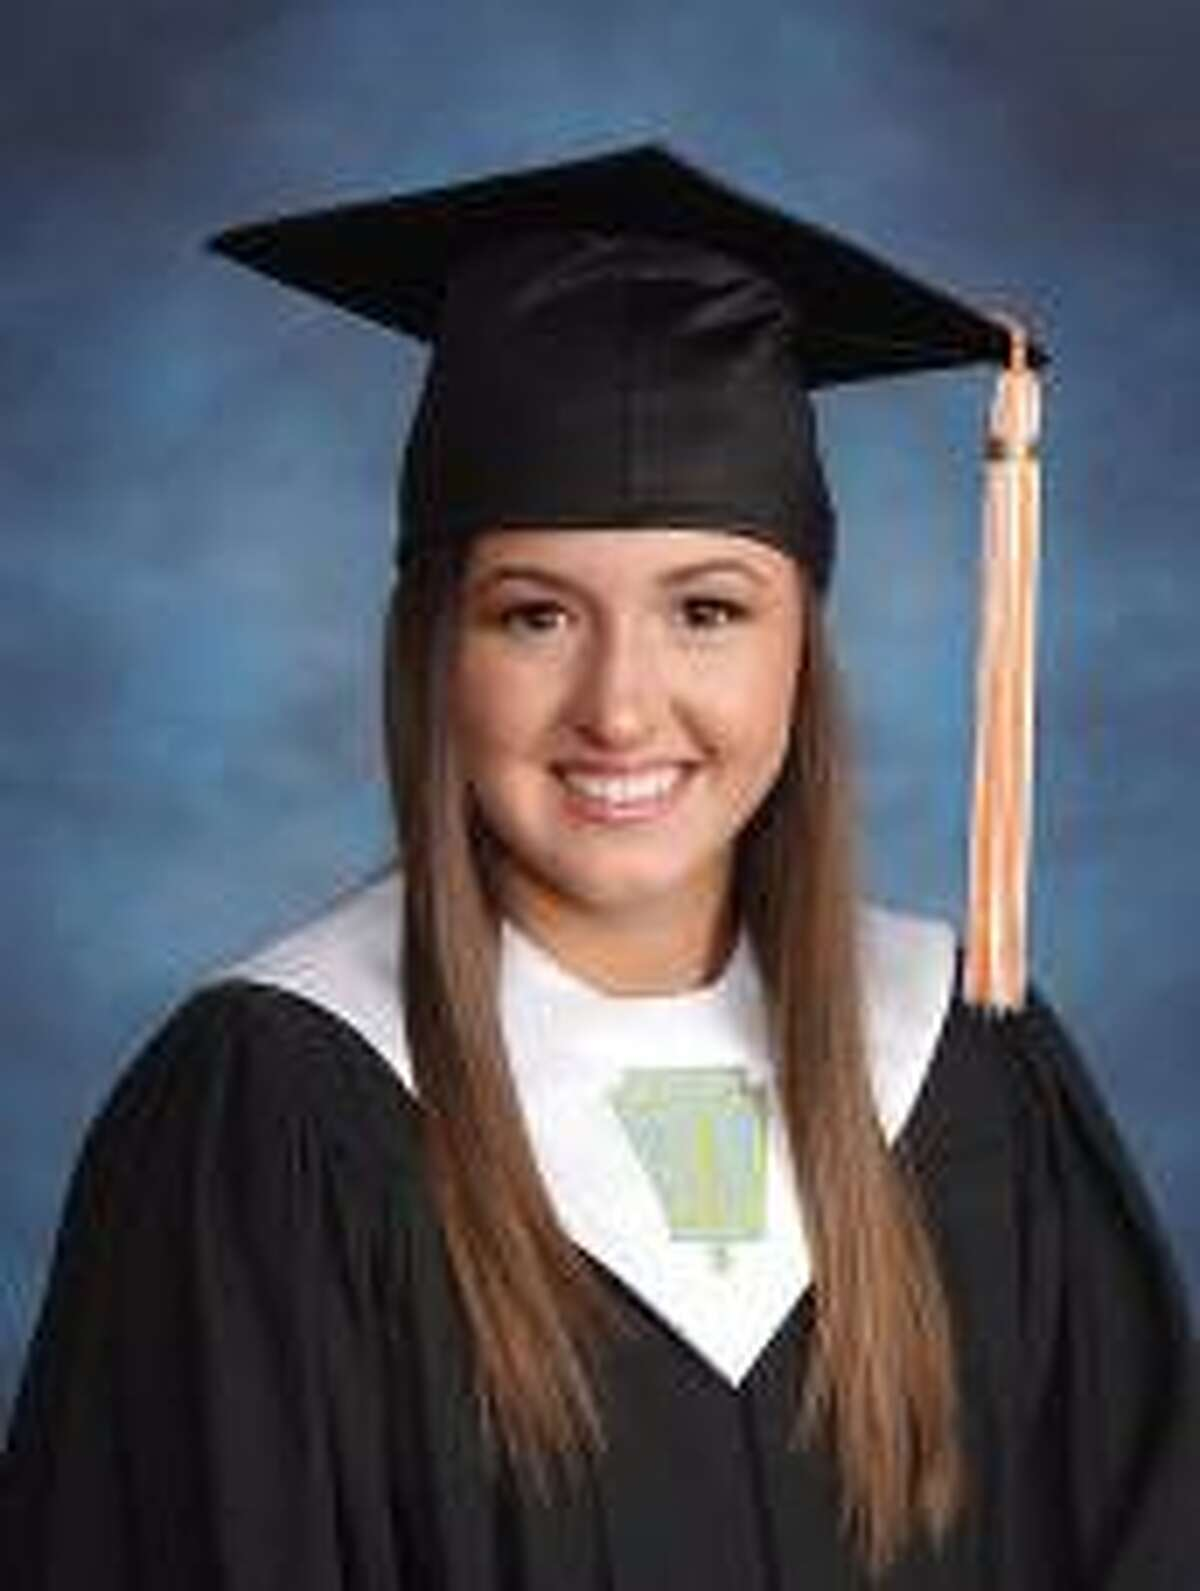 La Porte High School's salutatorian is Emma Staes.